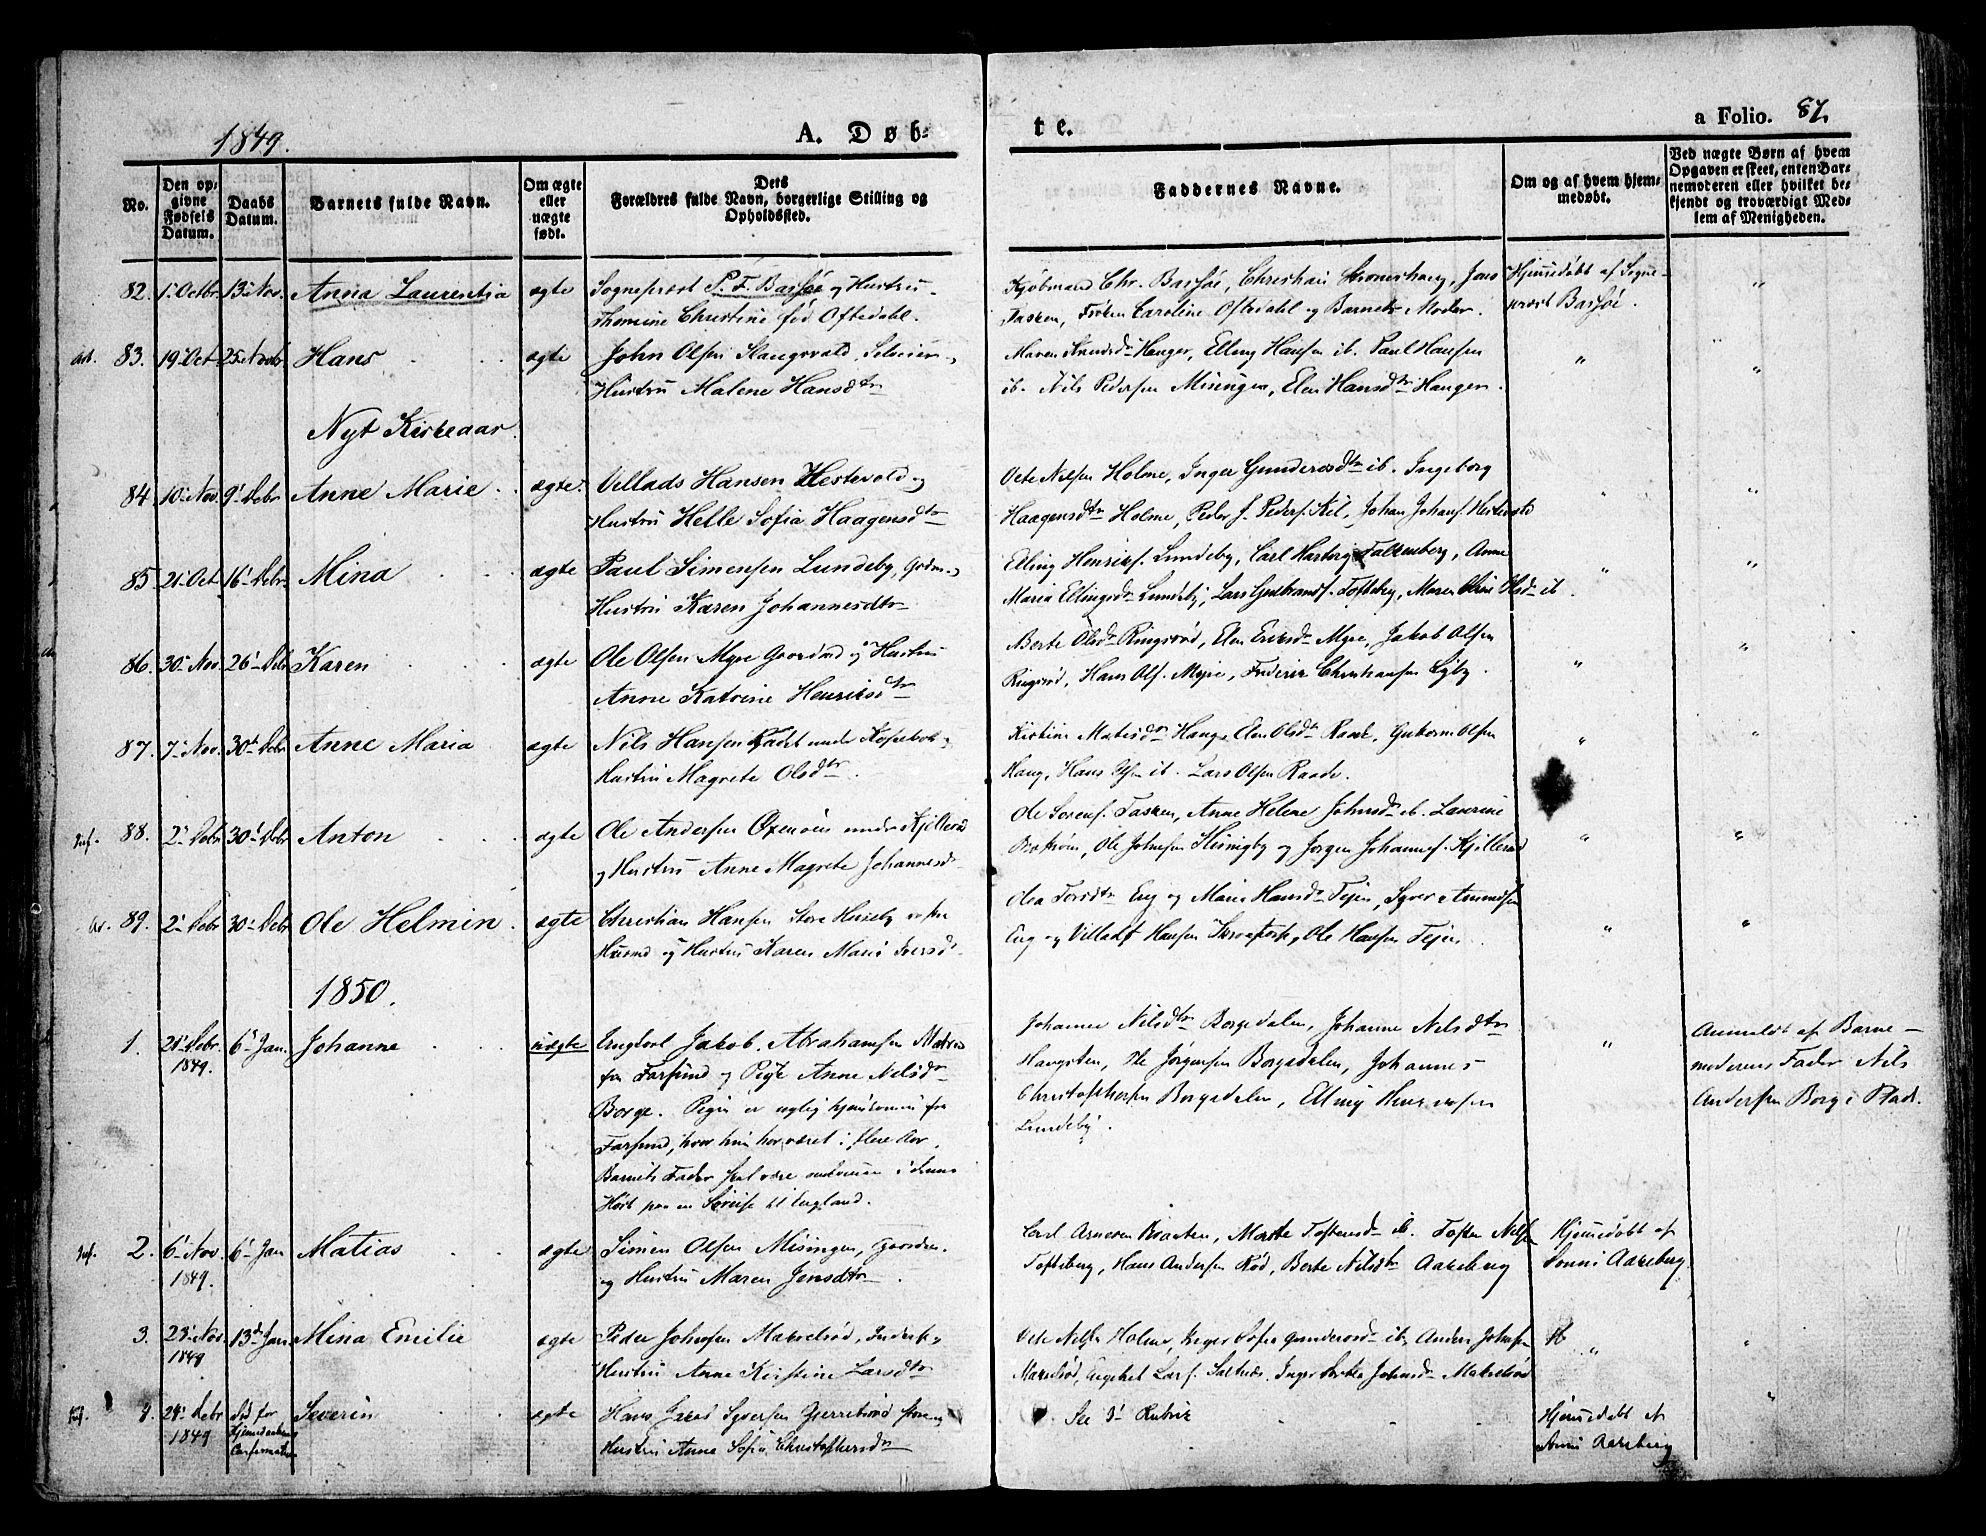 SAO, Råde prestekontor kirkebøker, F/Fa/L0005: Ministerialbok nr. 5, 1830-1853, s. 87